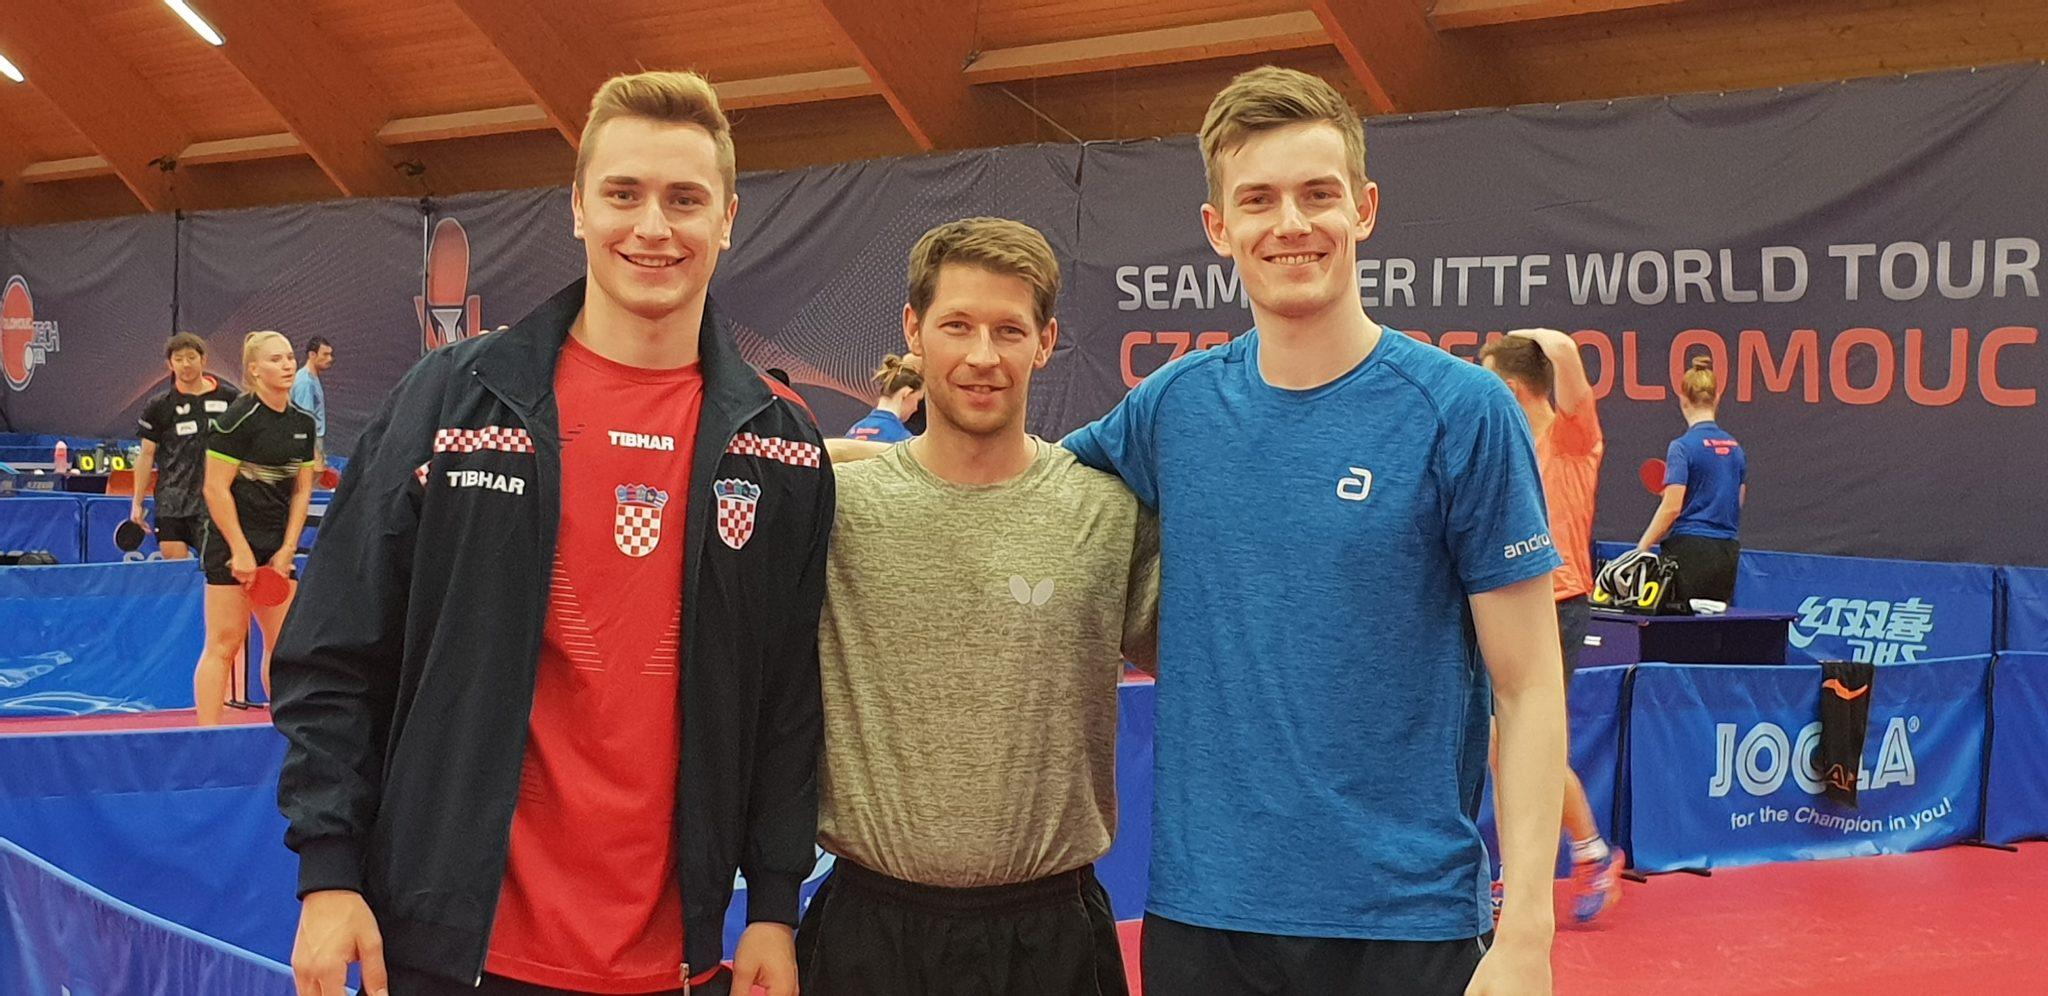 ITTFワールドツアー チェコオープン到着!